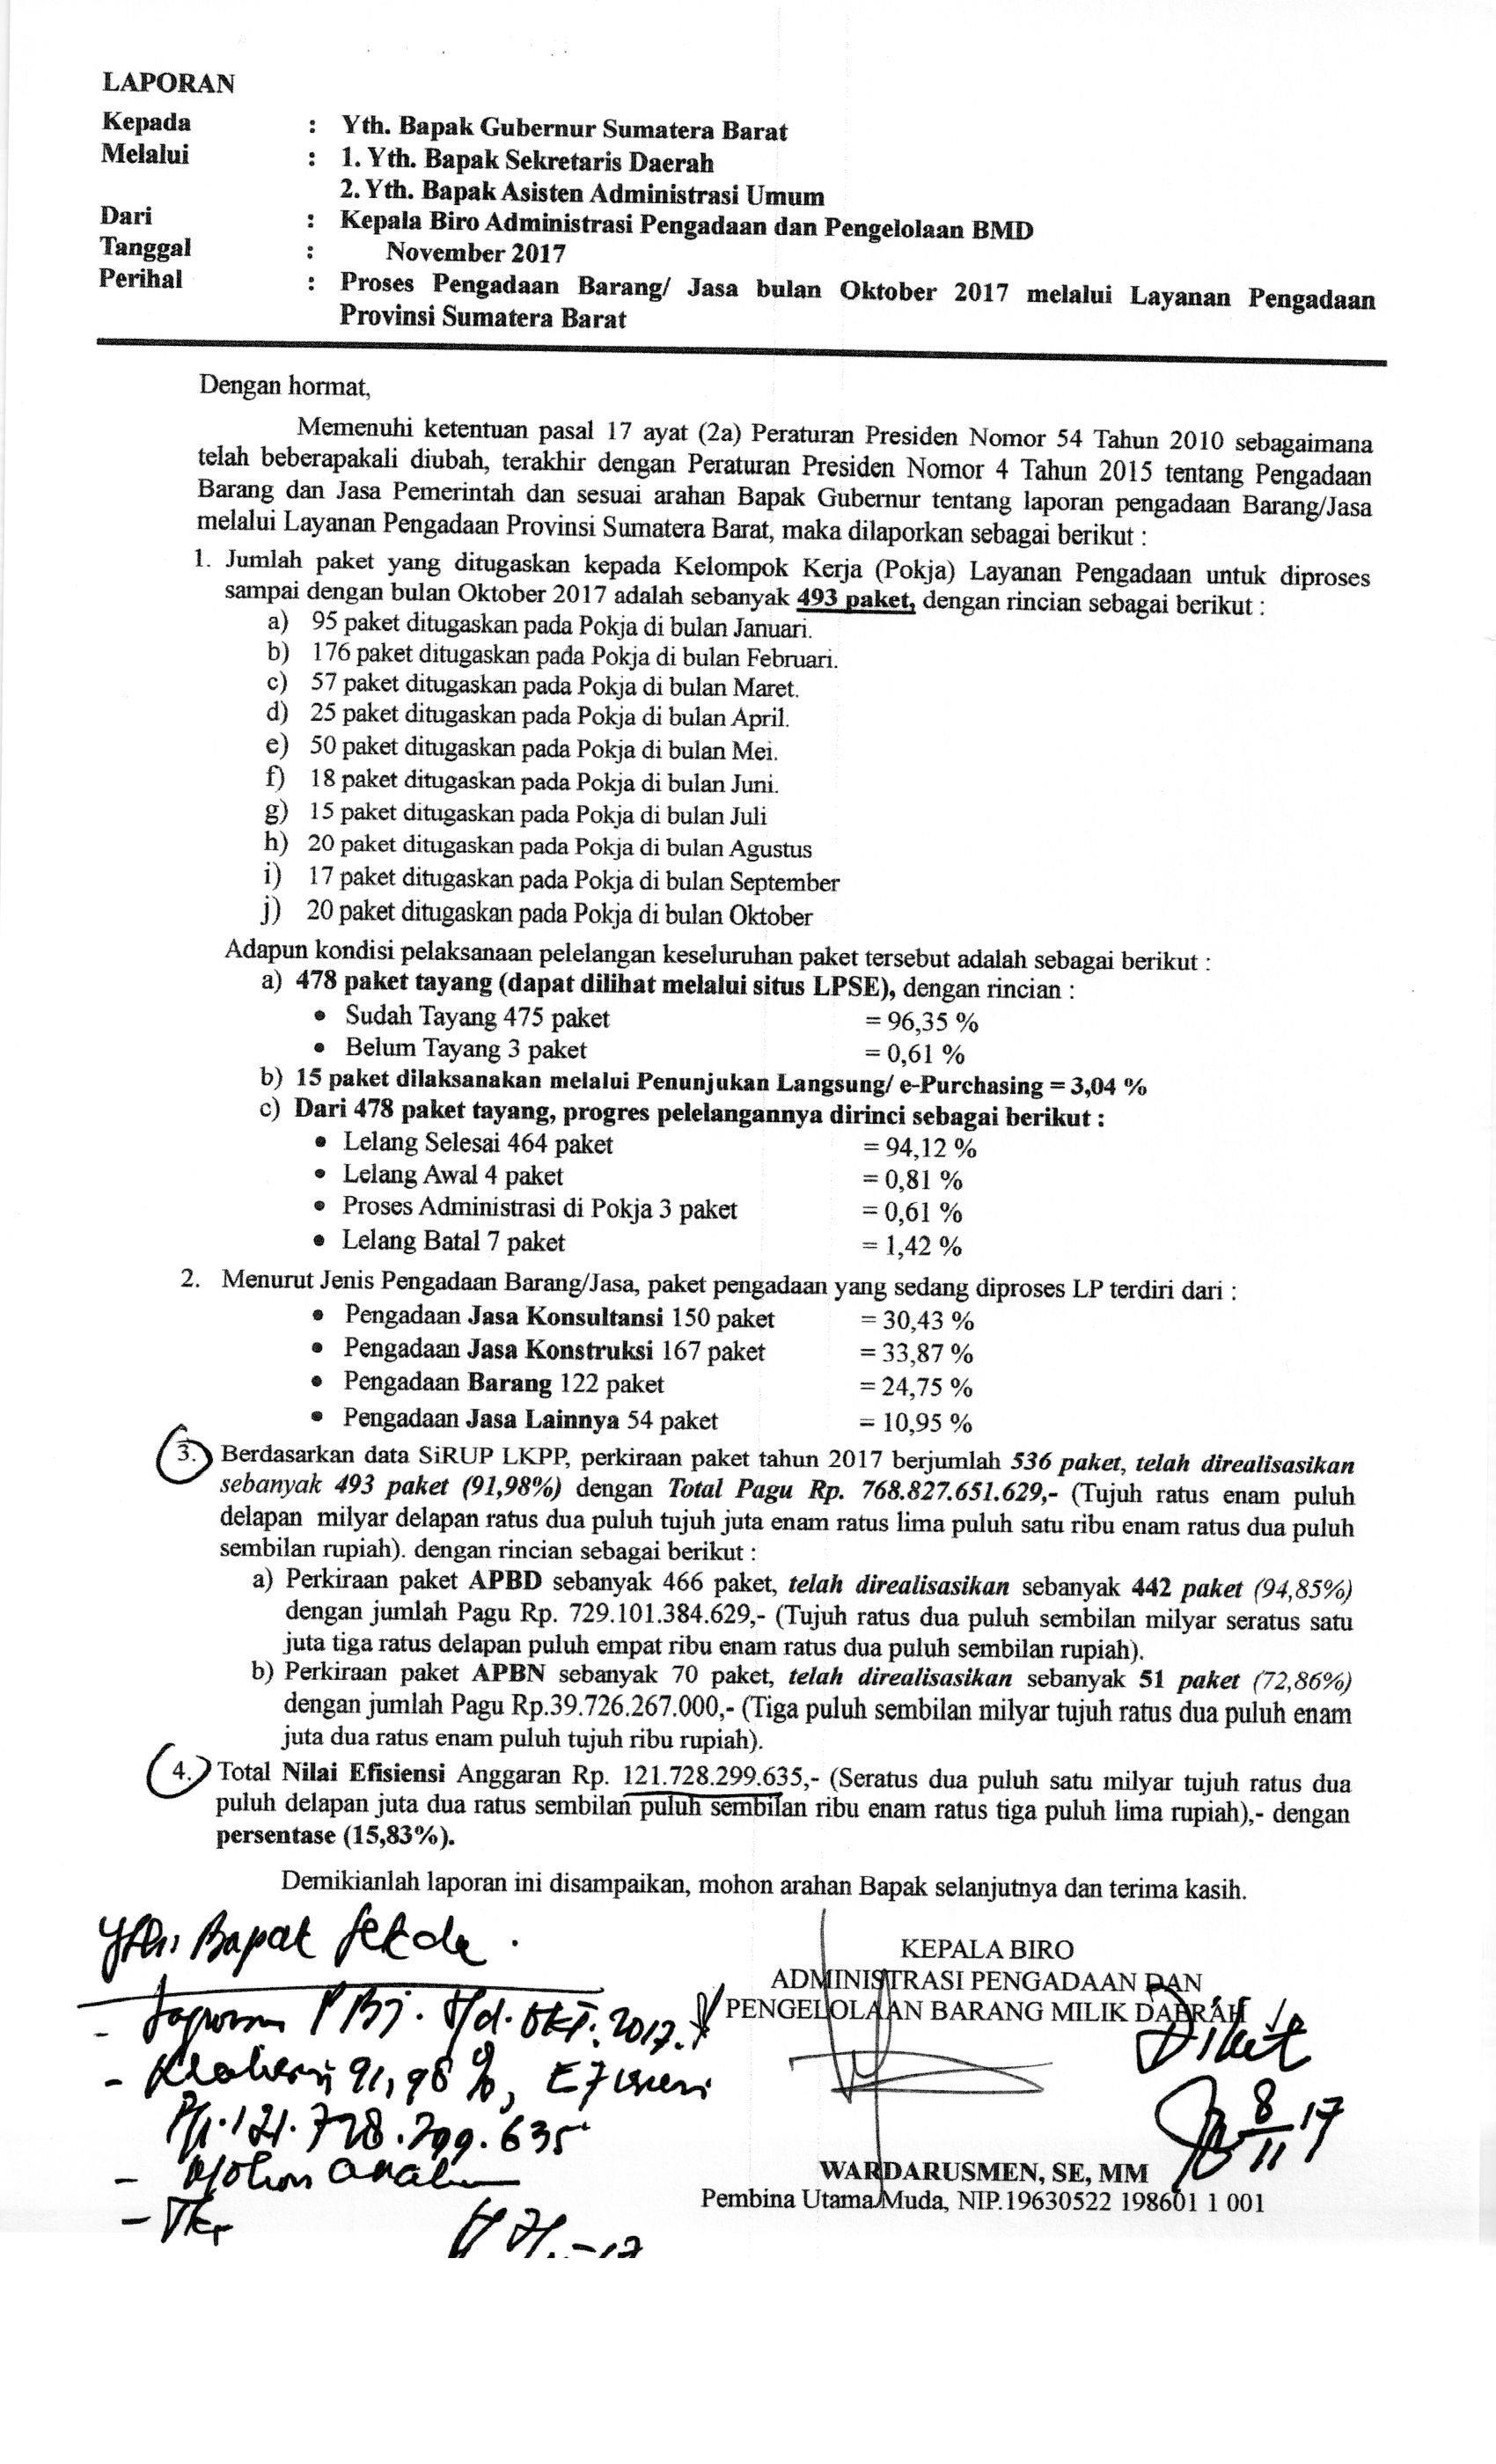 Proses Pengadaan Barang/Jasa Bulan Oktober 2017 Melalui Layanan Pengadaan Provinsi Sumatera Barat